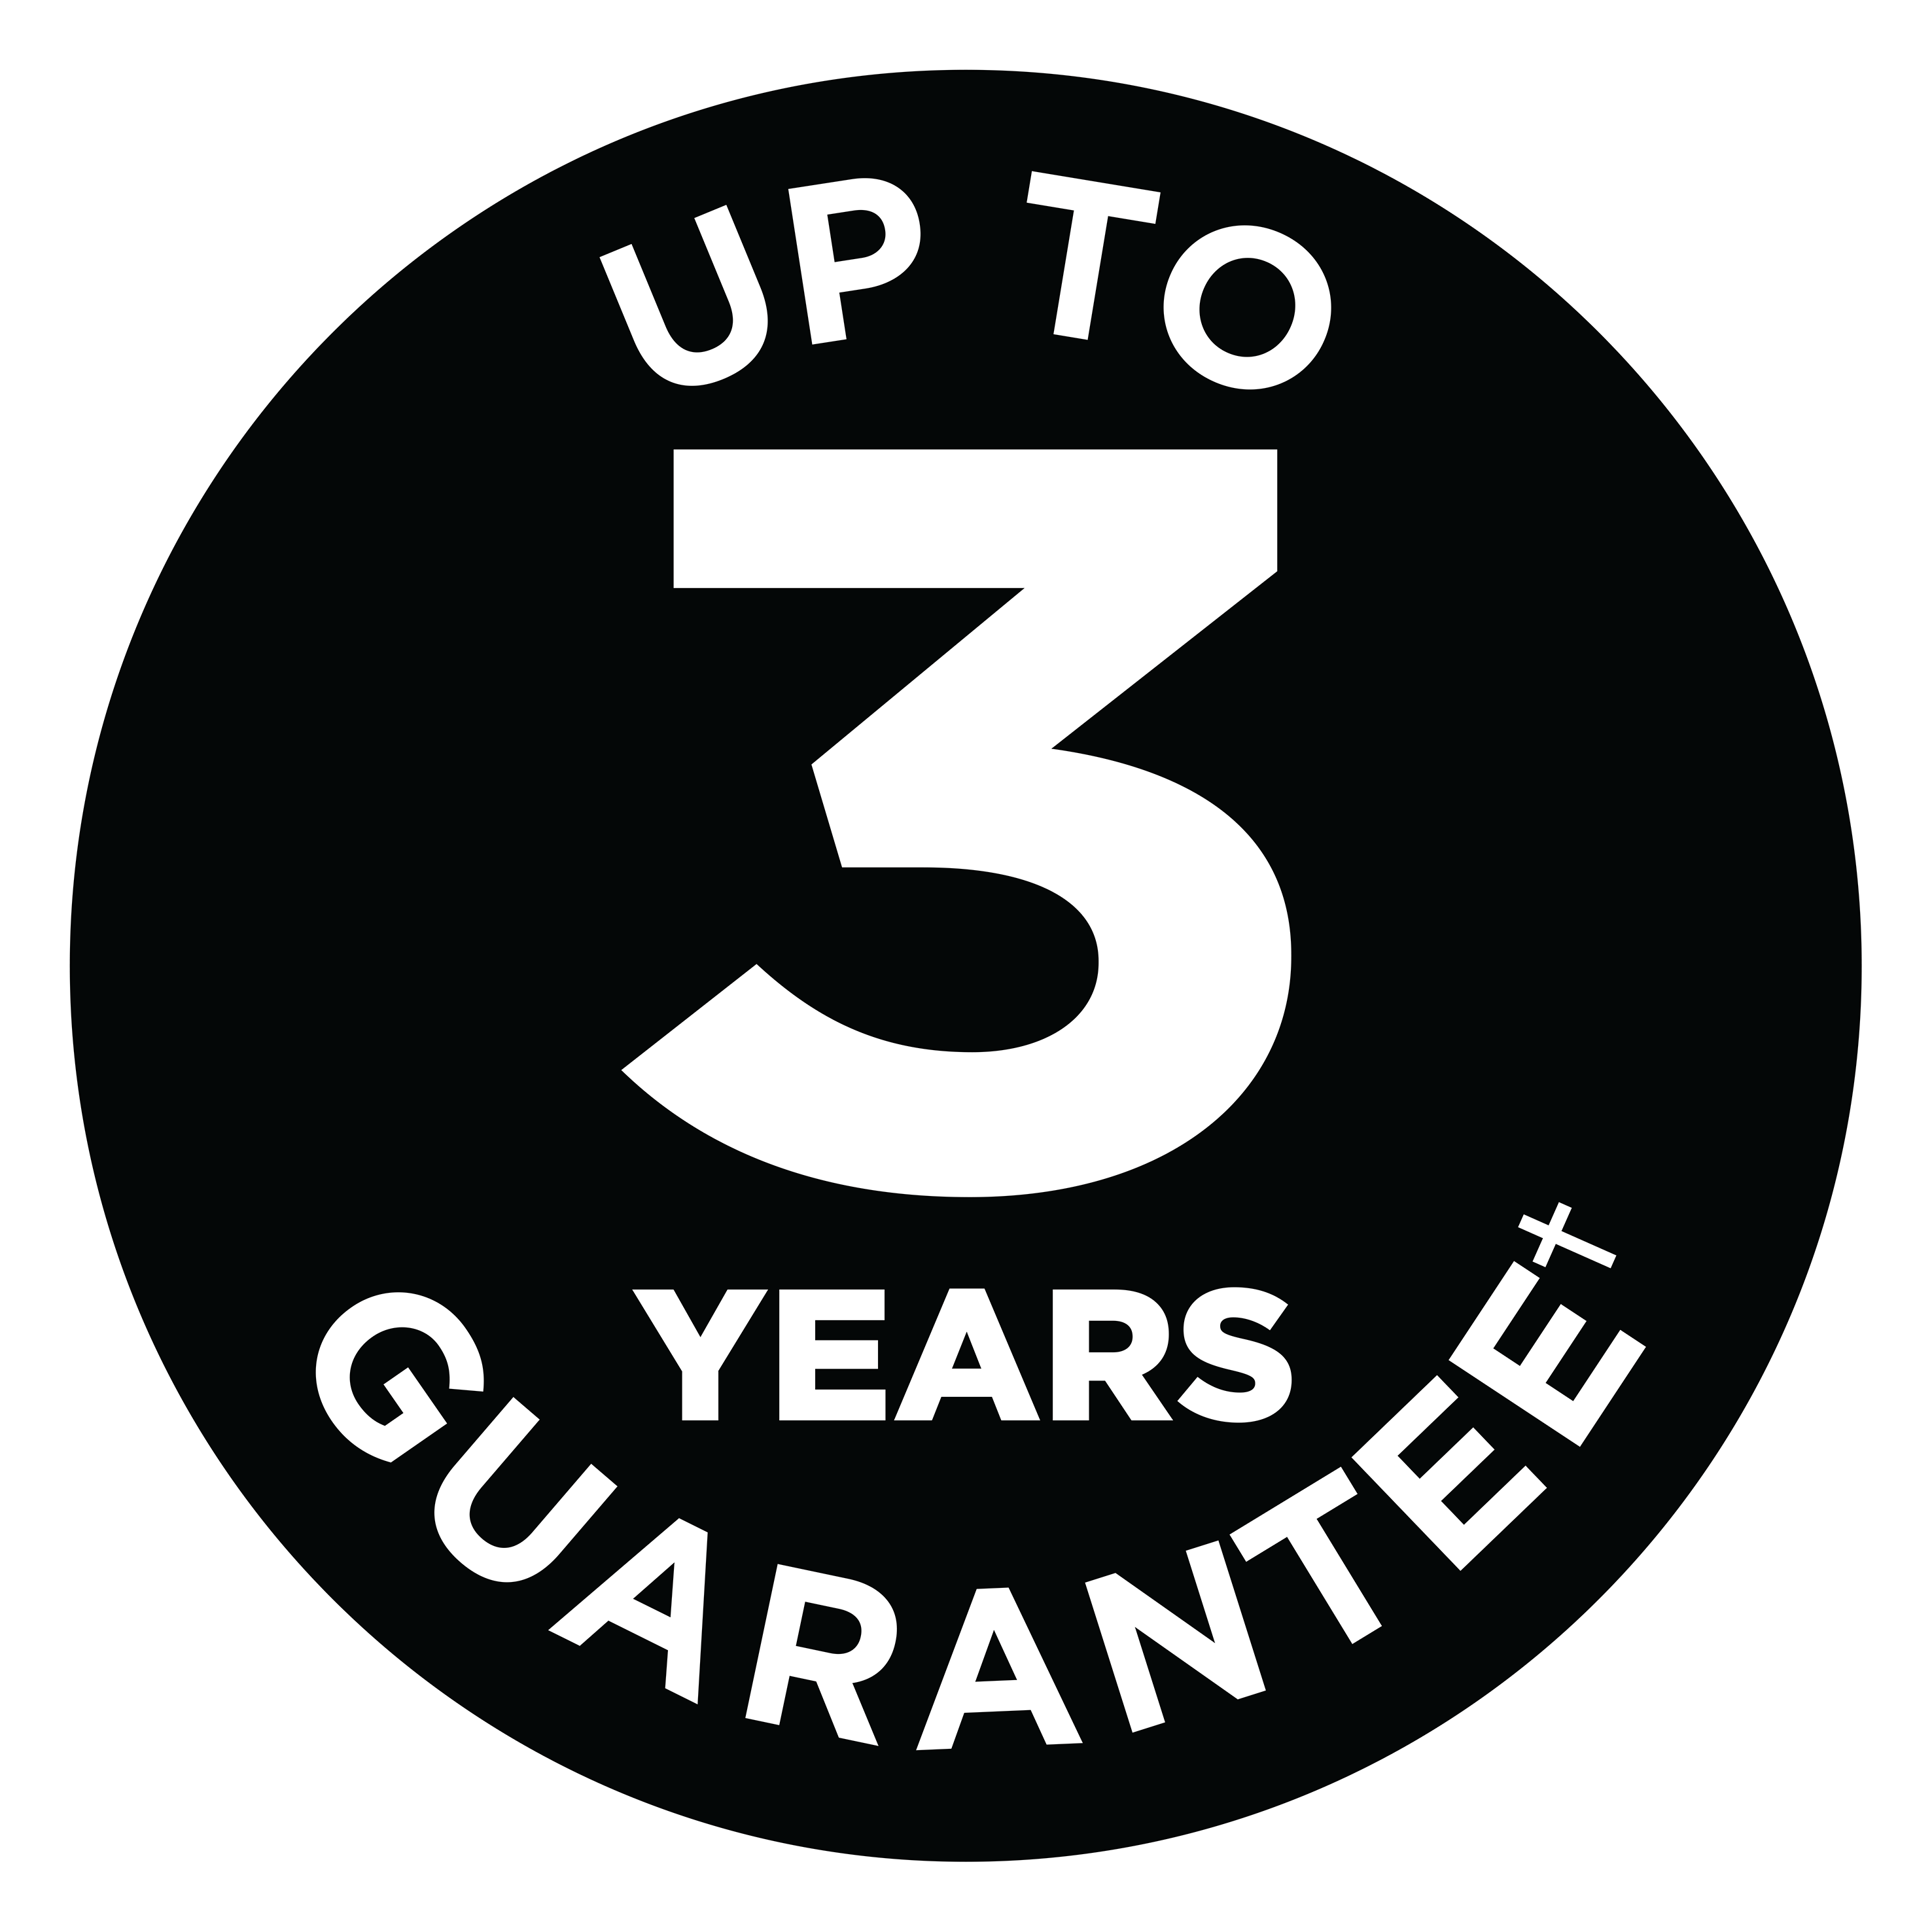 Up To 3 Years Guarantee